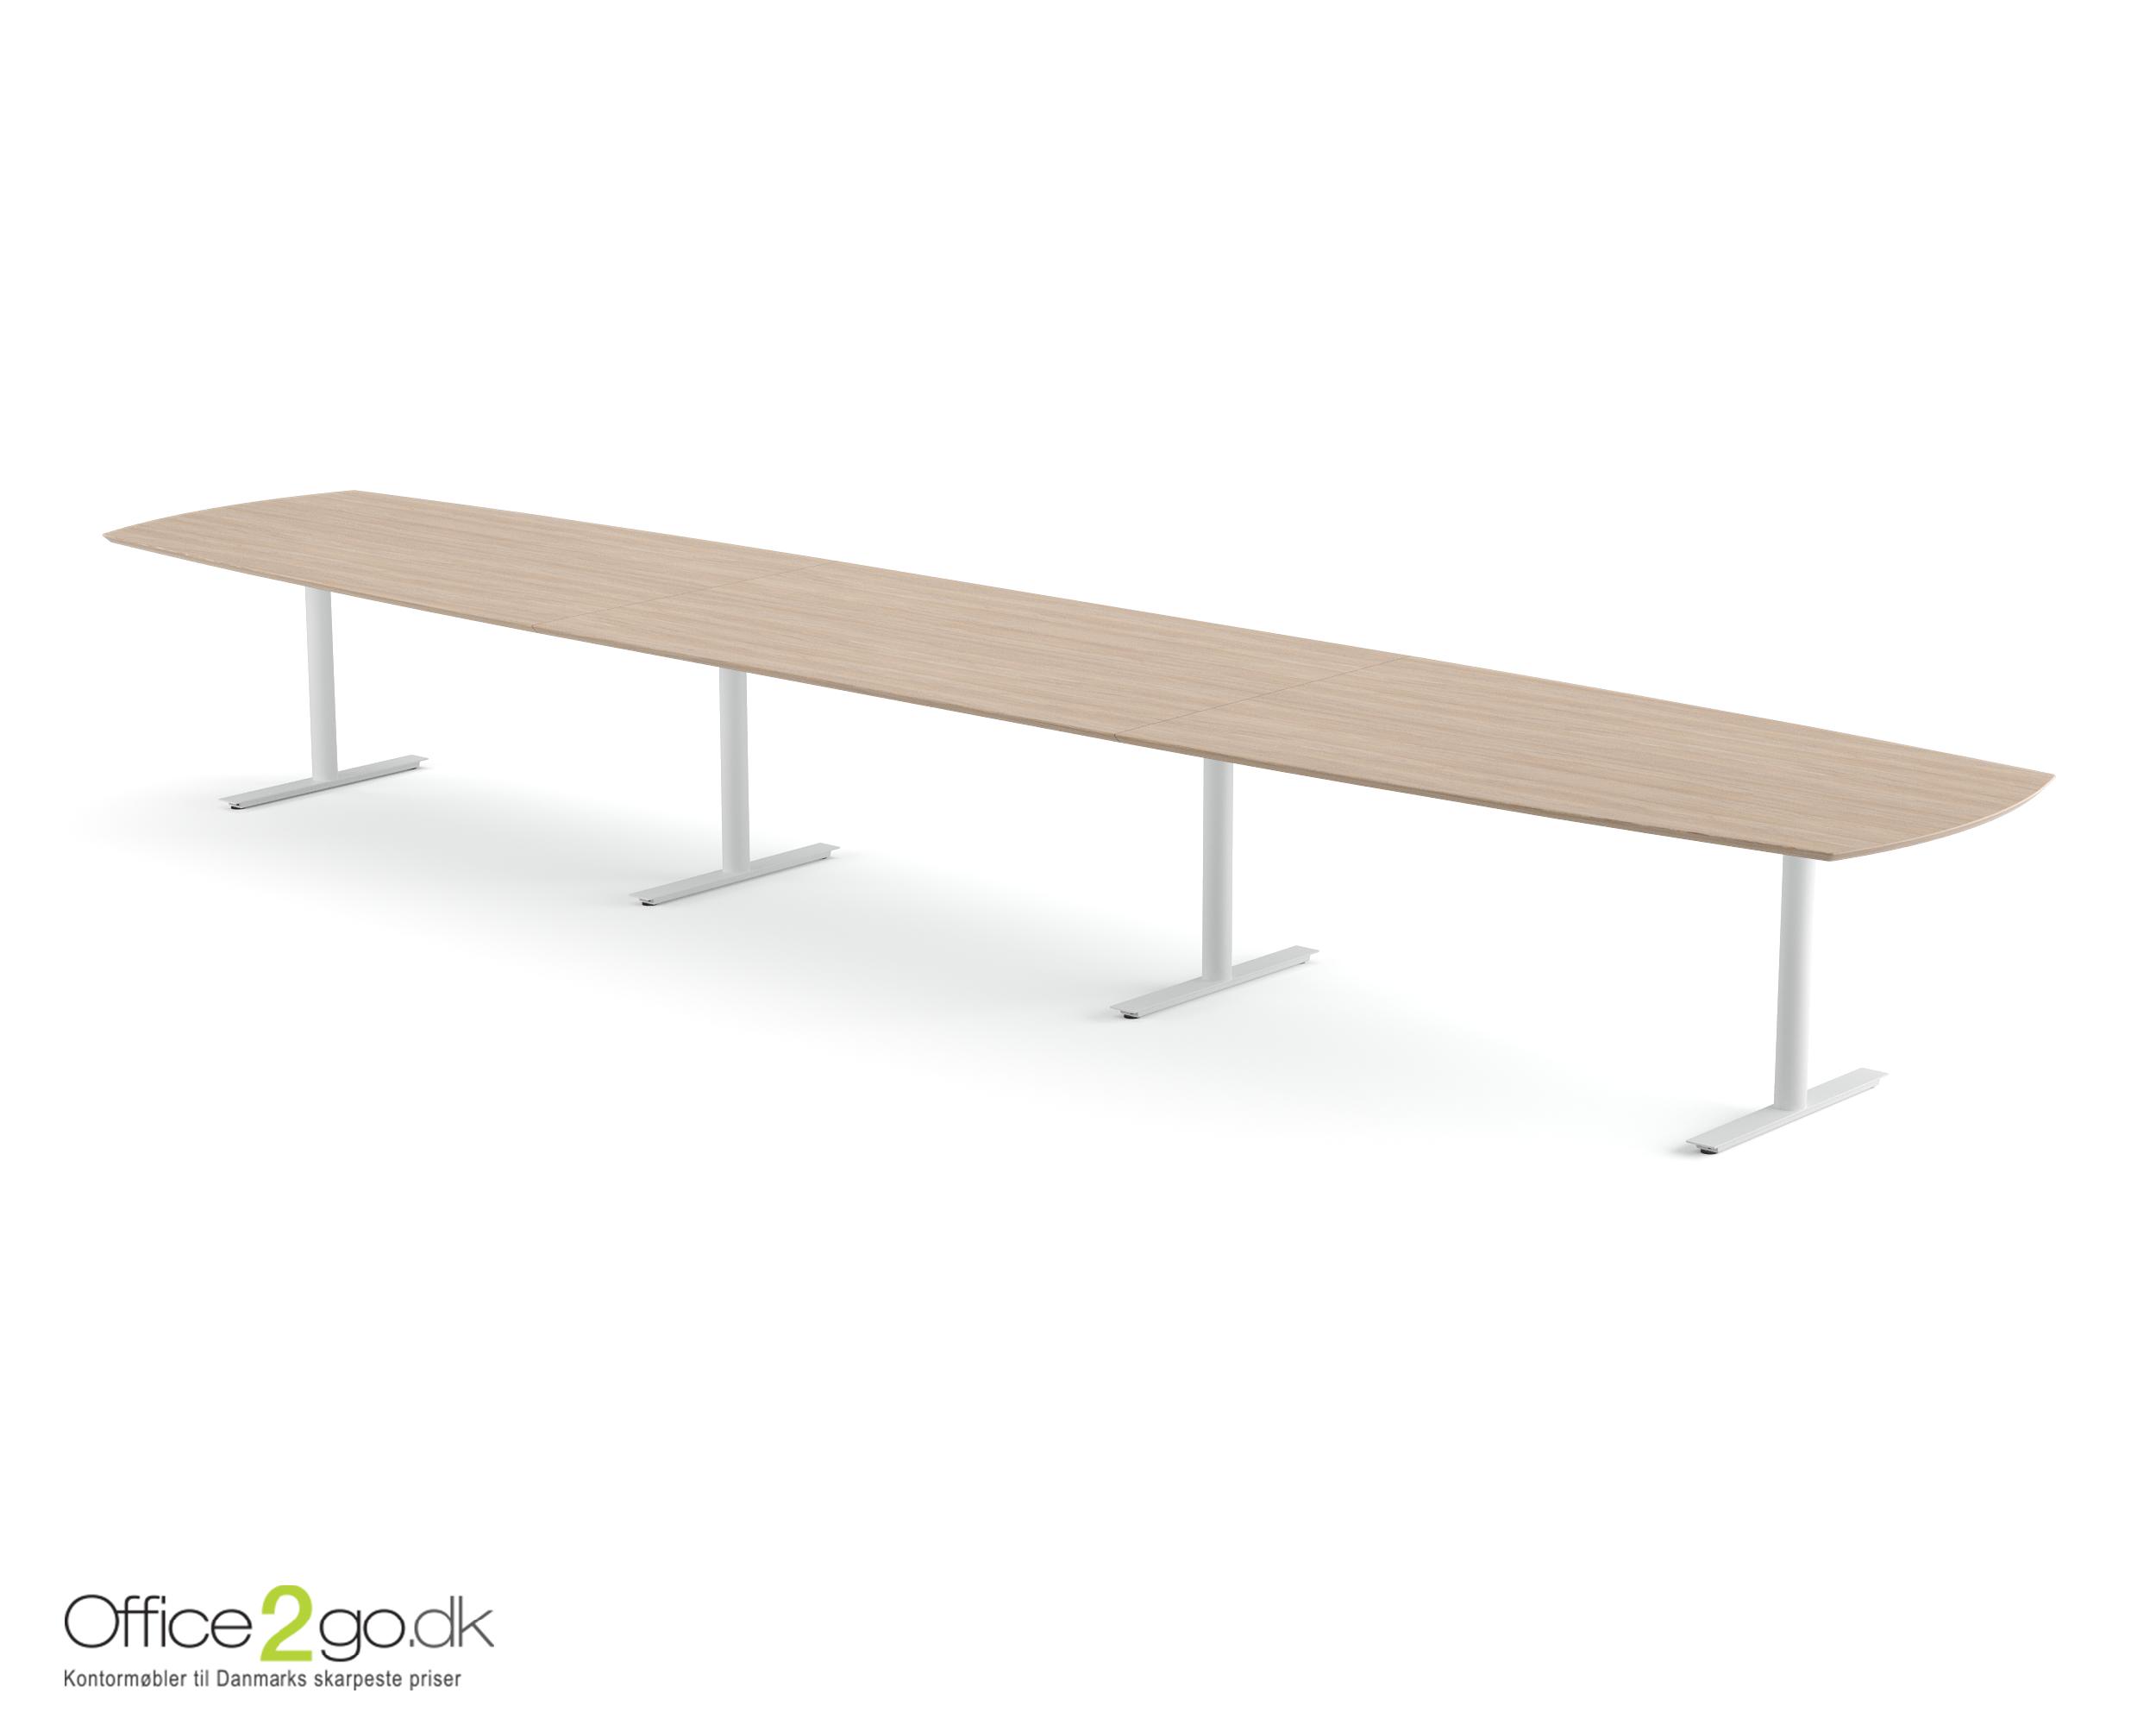 InLine mødebord - 18-20 personer - 560 cm.